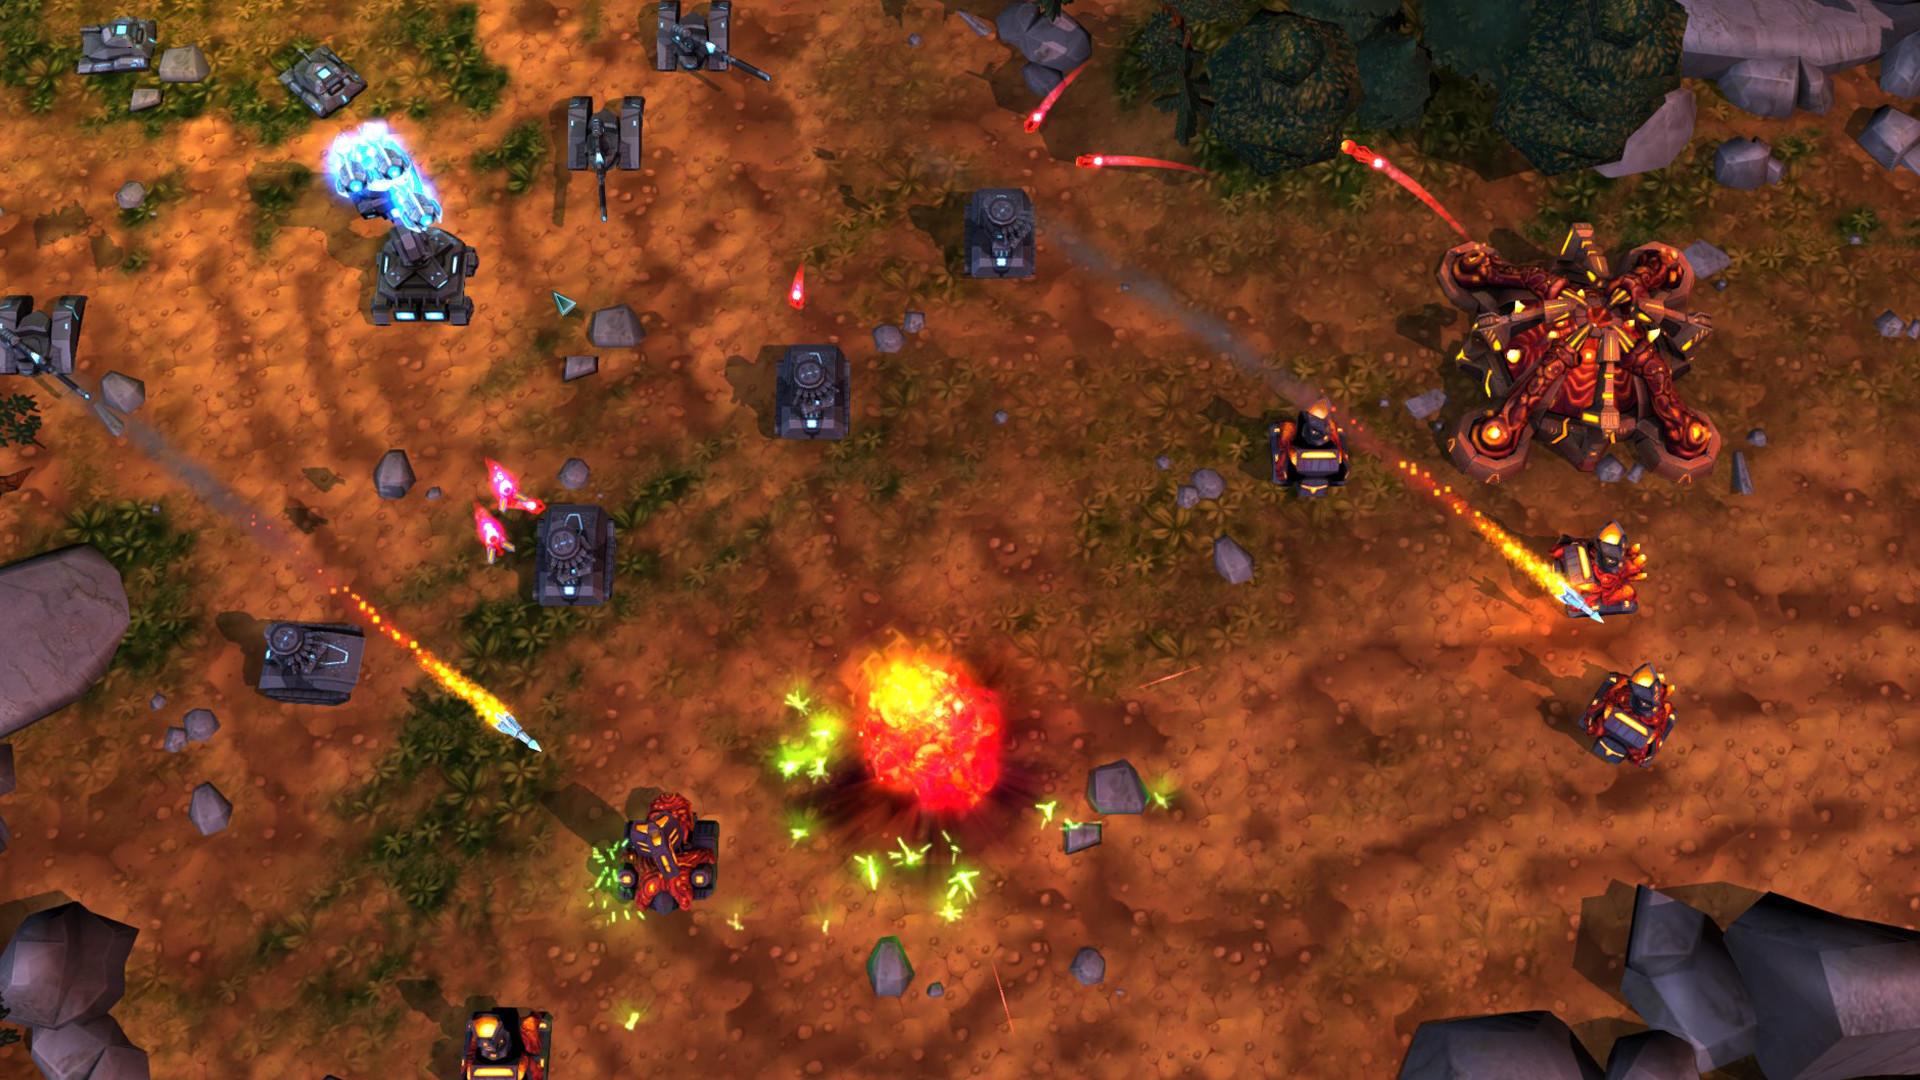 Tanks vs Aliens Screenshot 2